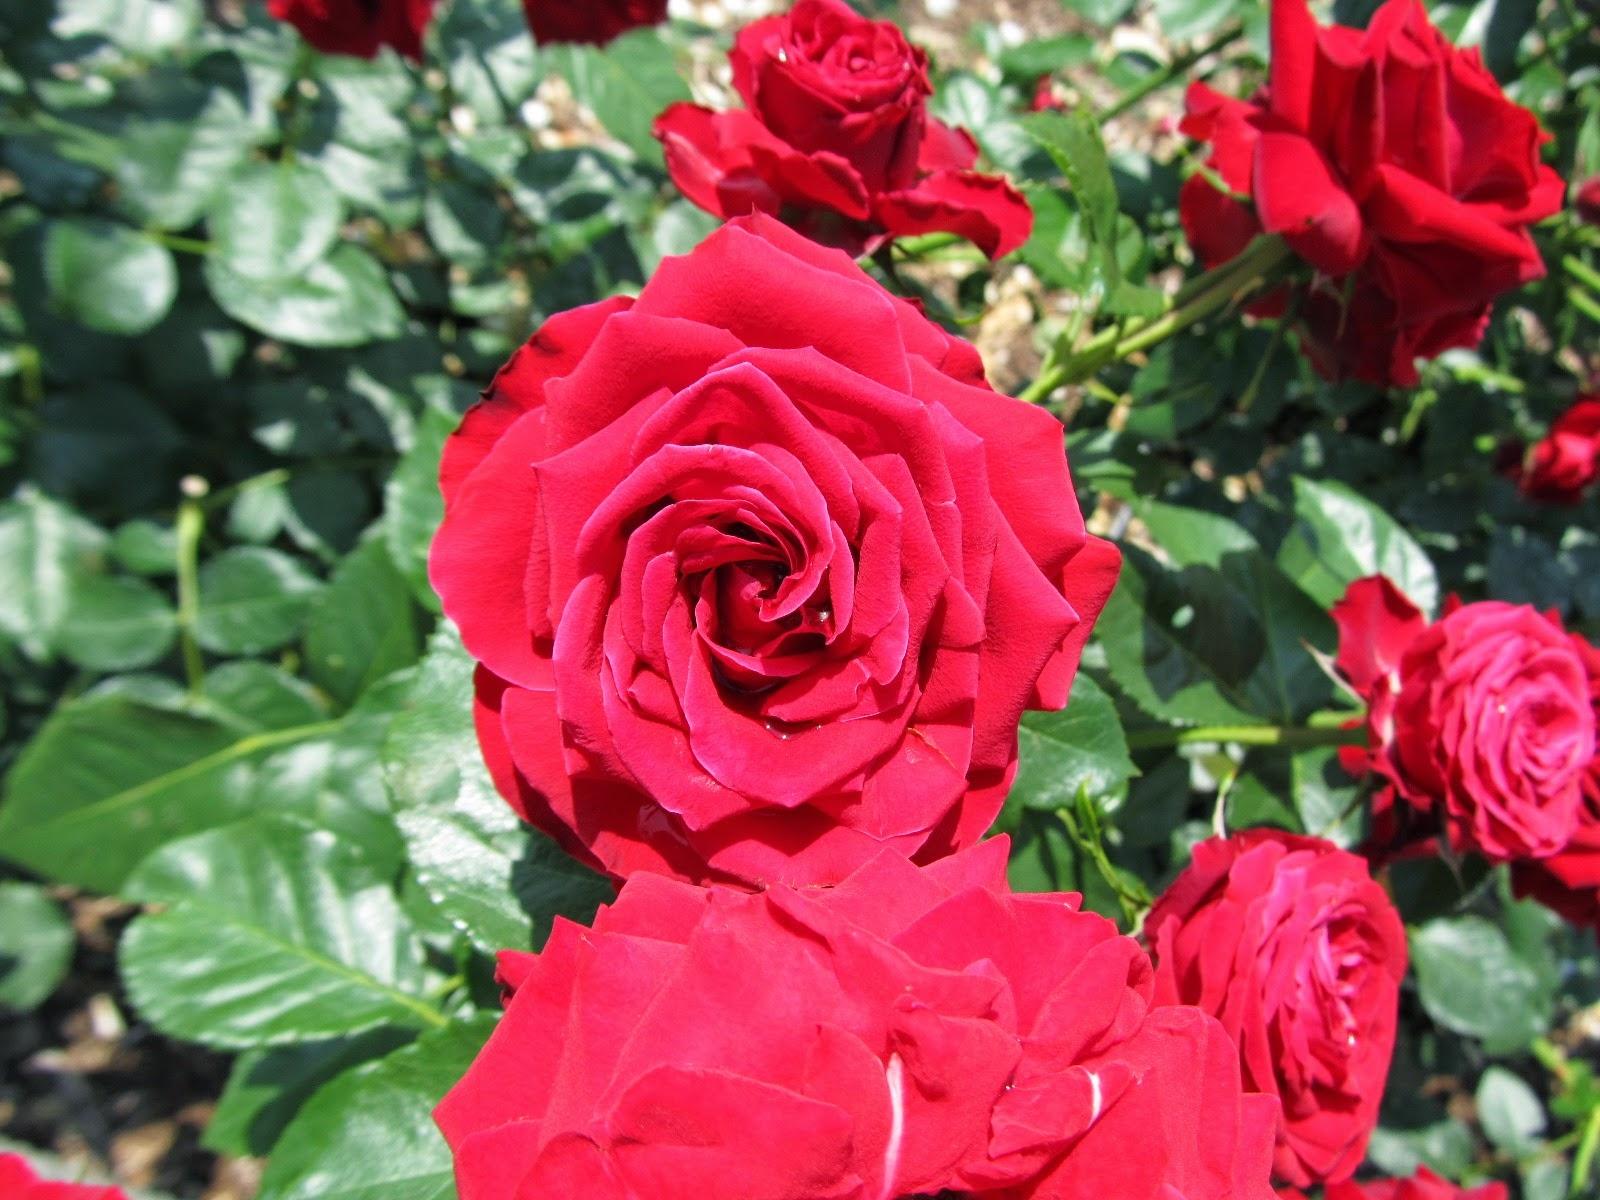 rose, flower, photography, nature - sanftekuss | ello